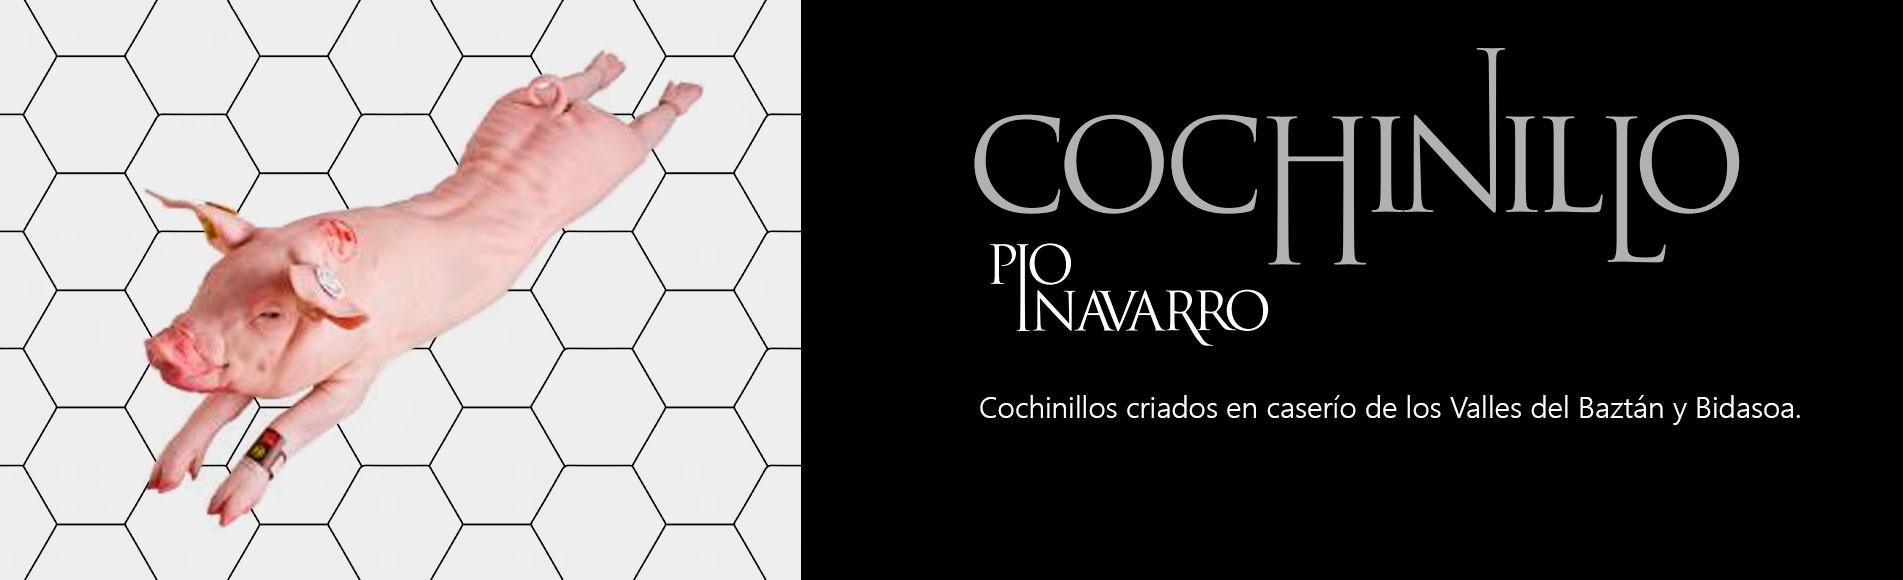 Cochinillo Pío Navarro de Navarra